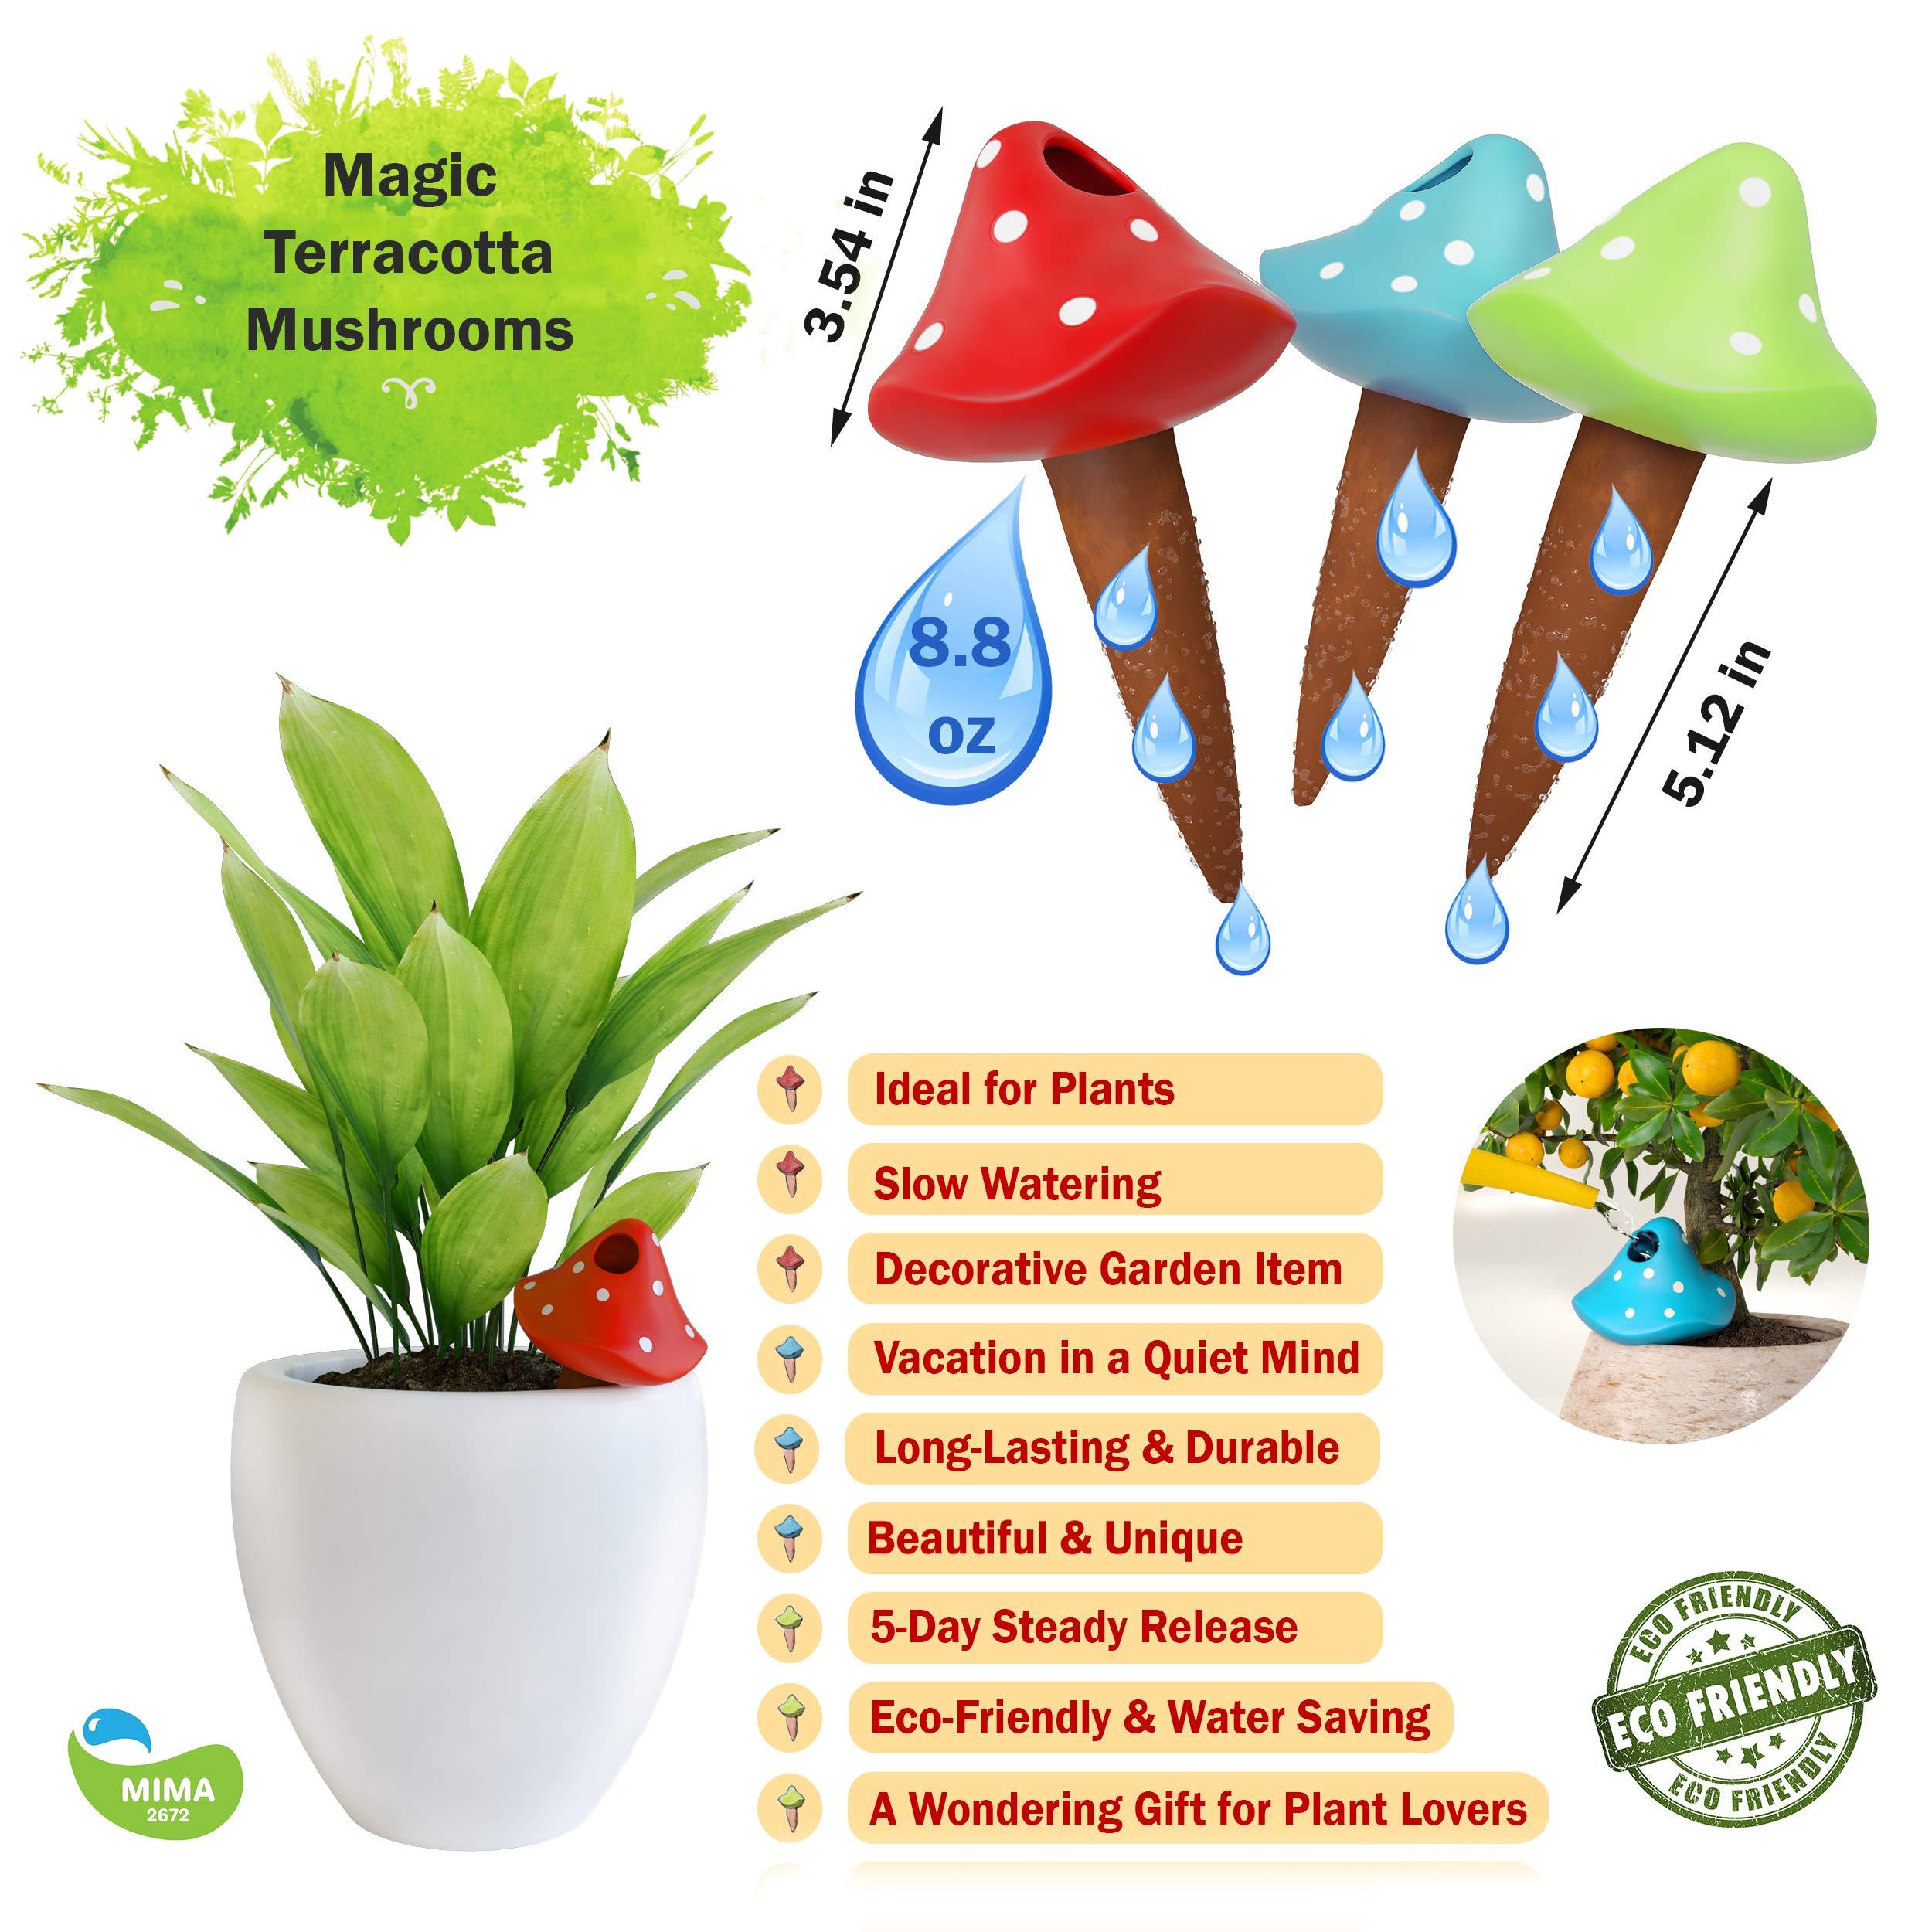 Watering Globes 3 Self Watering System Spikes,Outdoor Garden Soil Moist,Mushroom